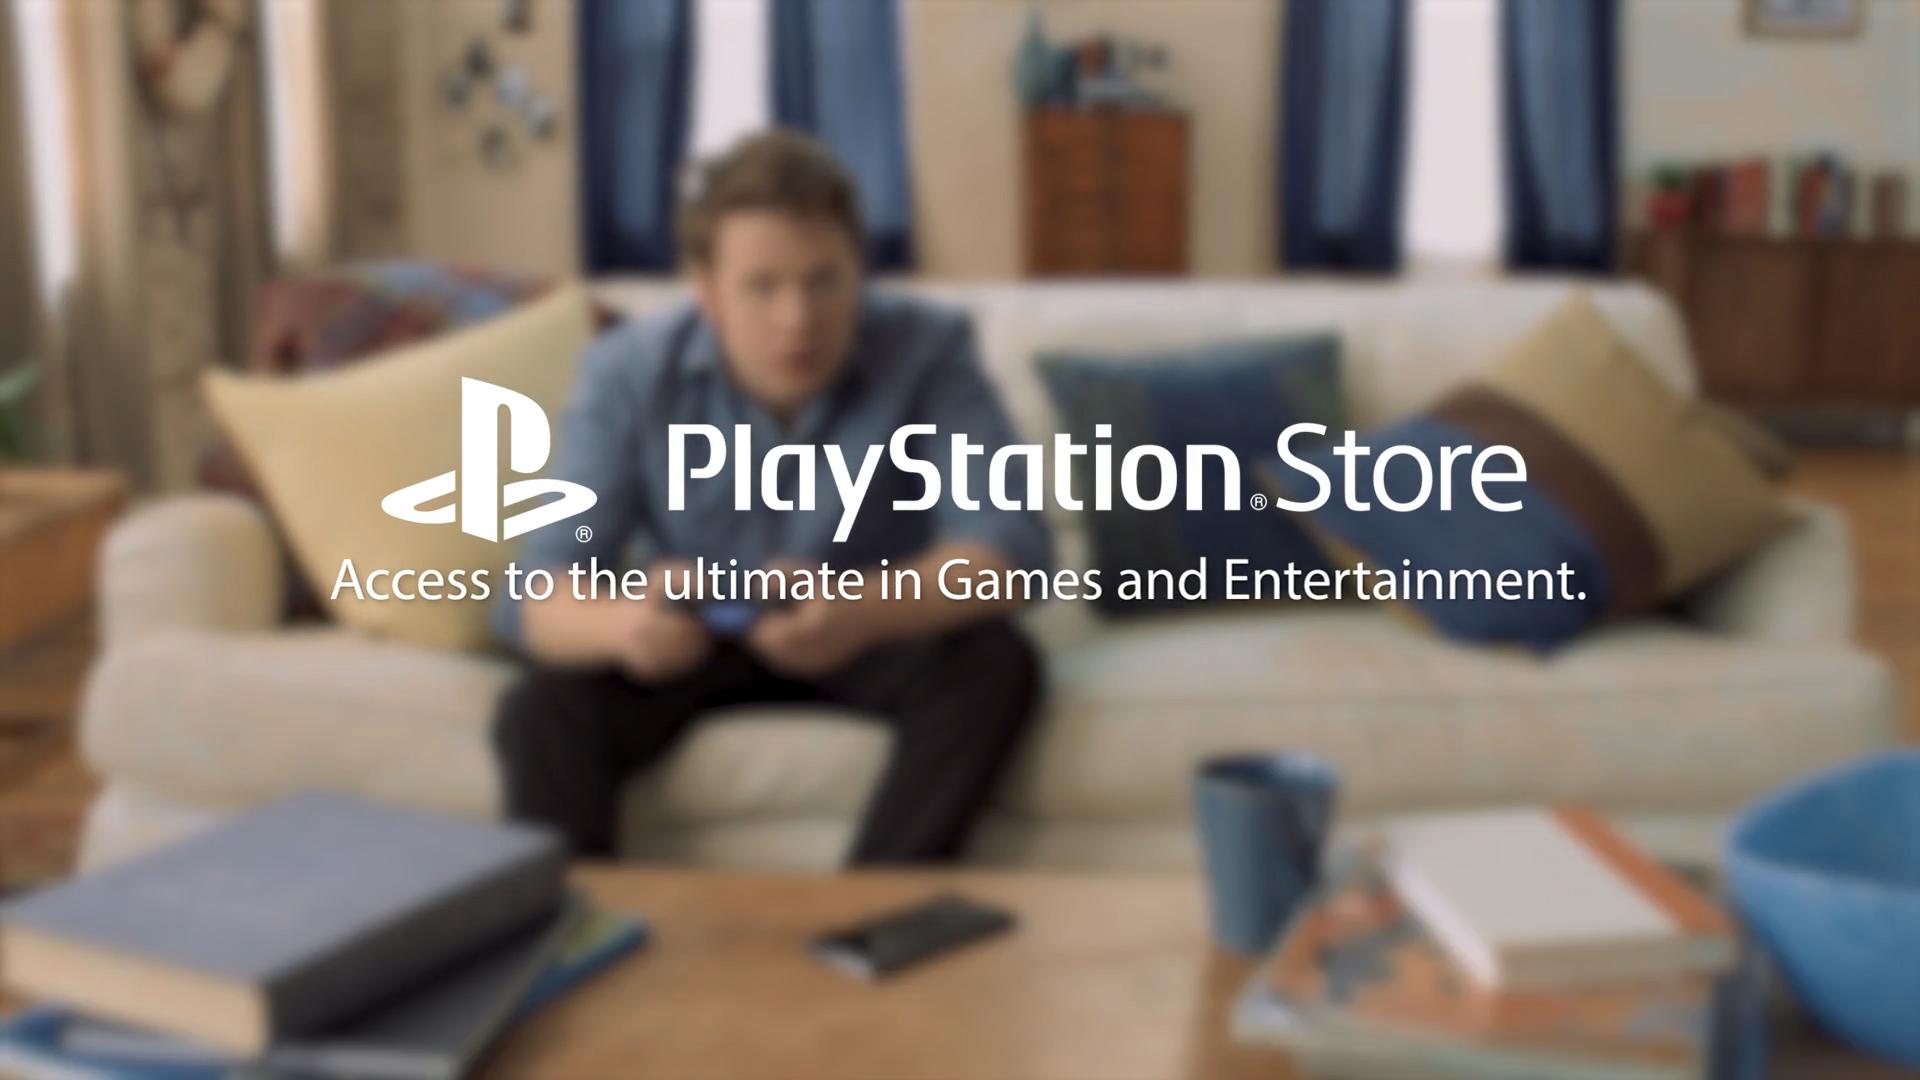 Playstation Store_6.jpg